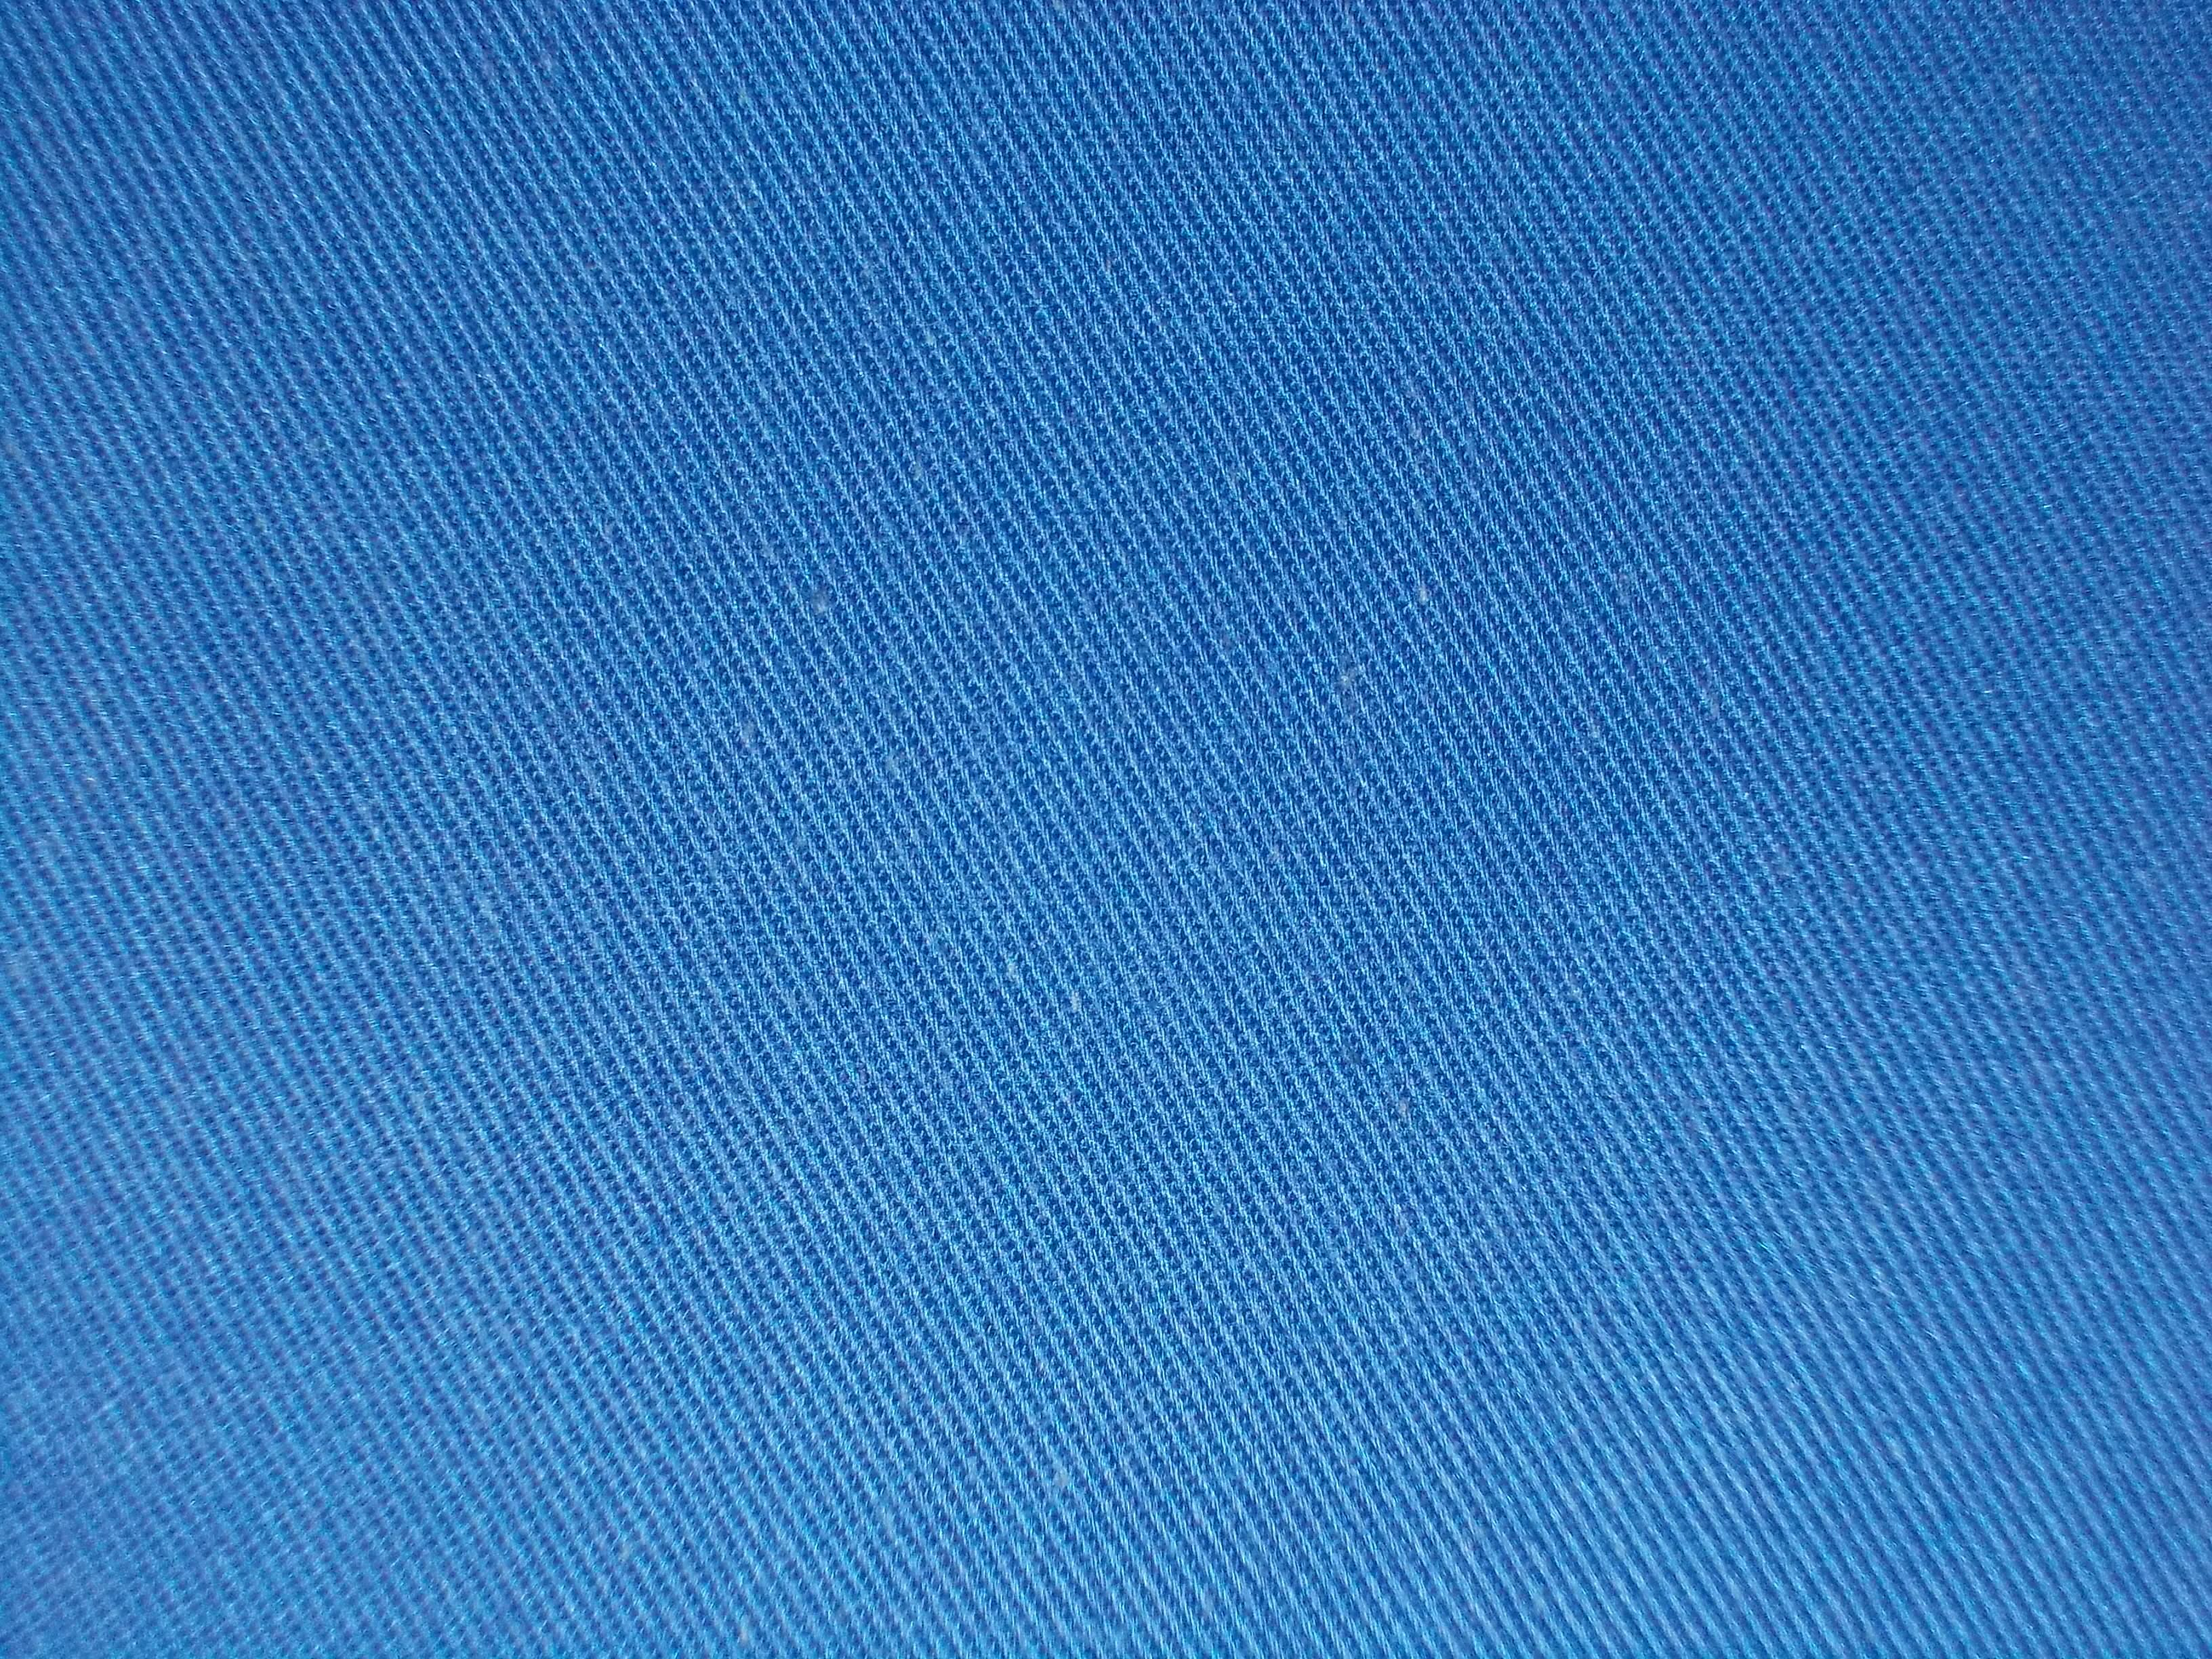 vải kaki cotton